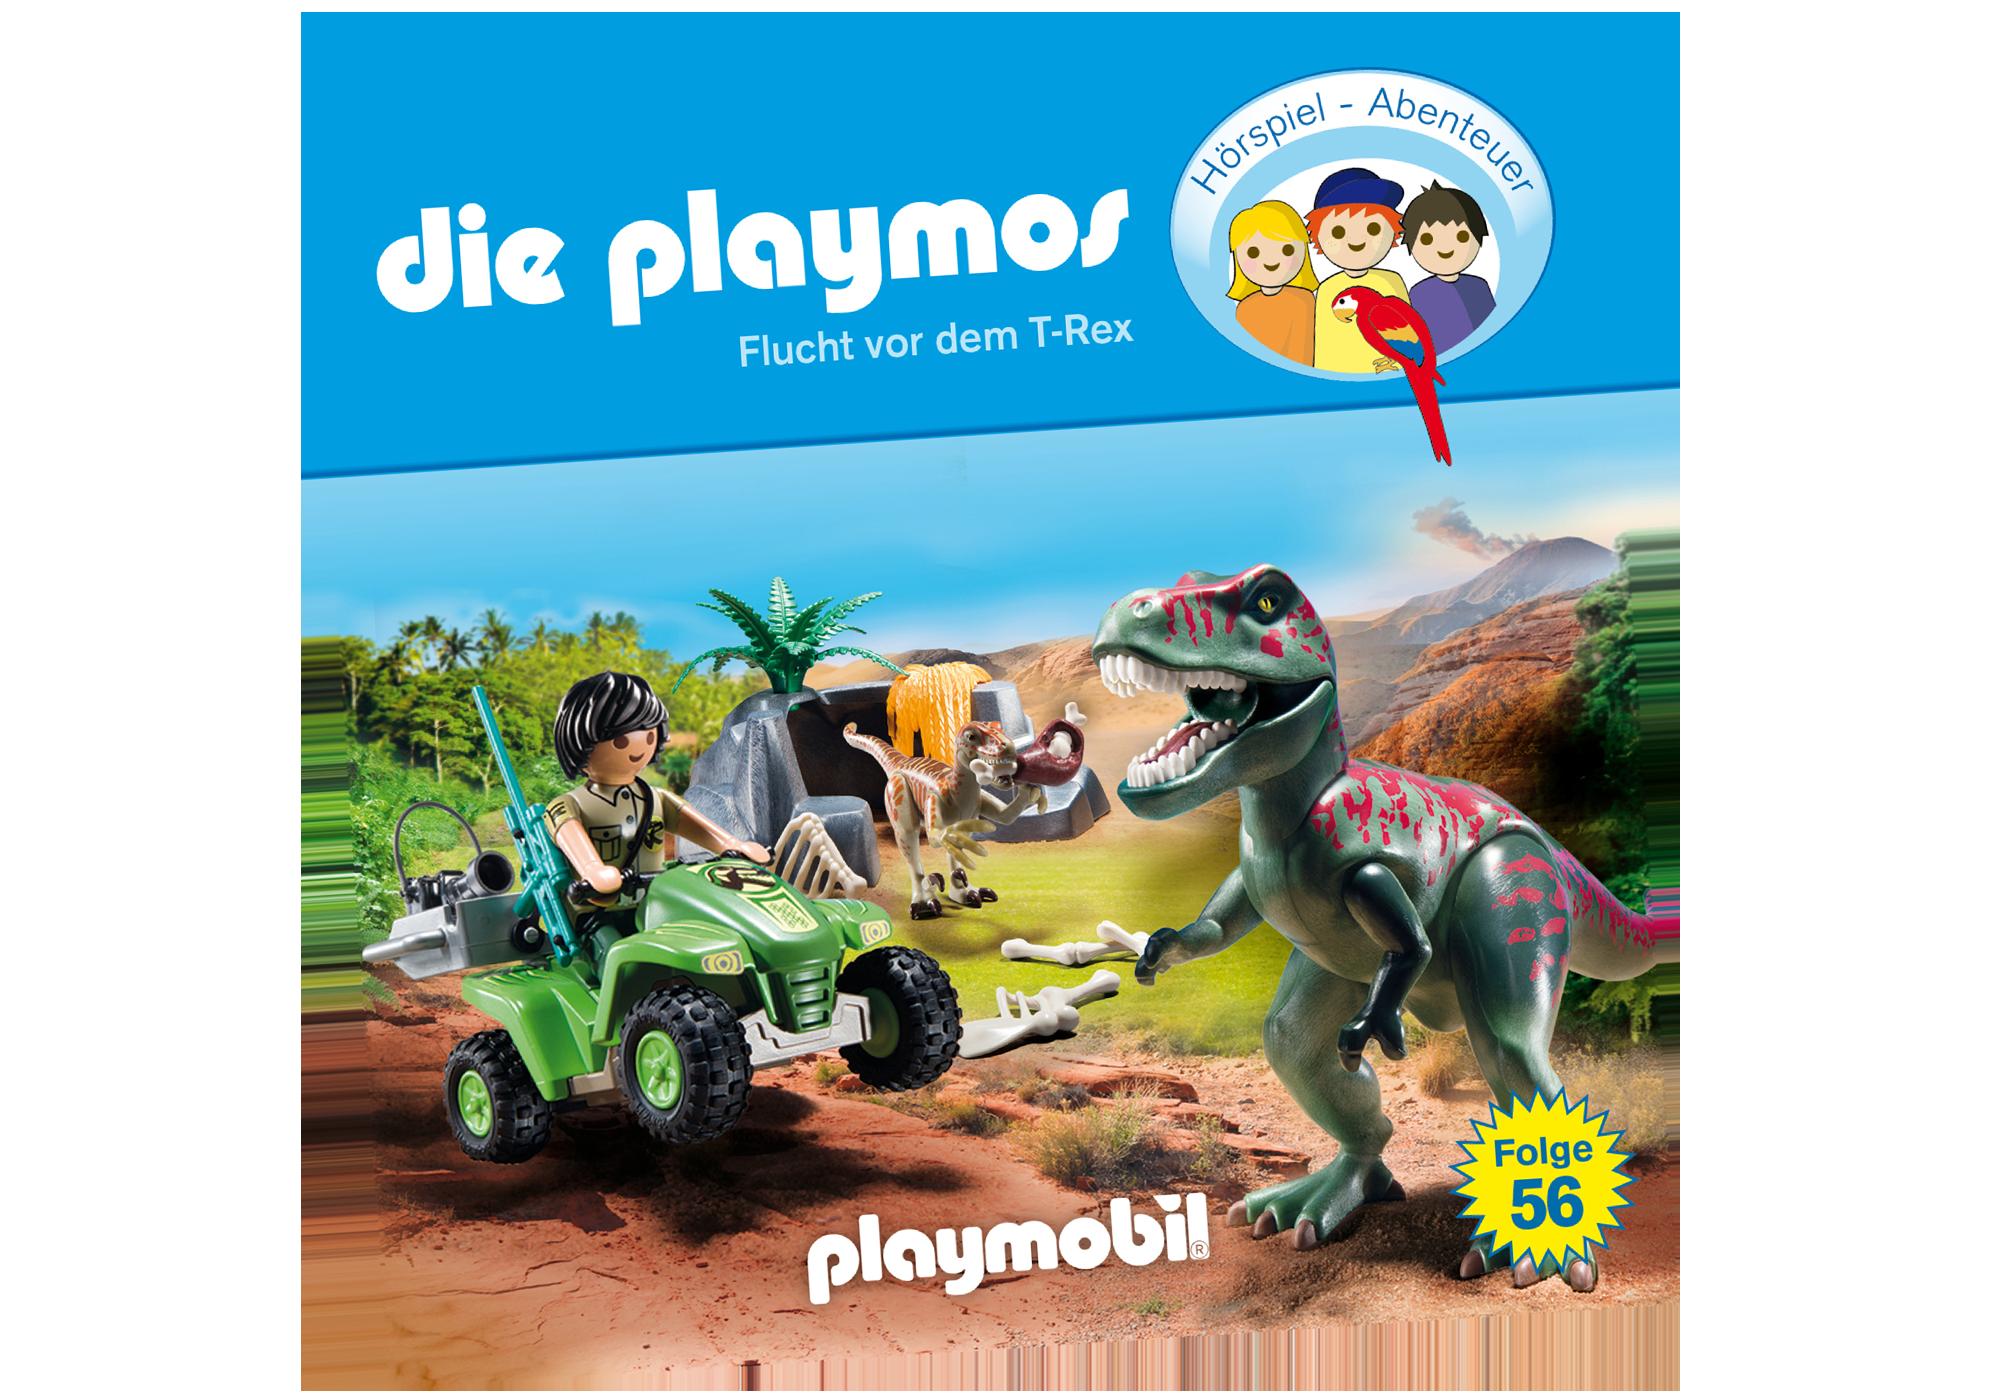 http://media.playmobil.com/i/playmobil/80008_product_detail